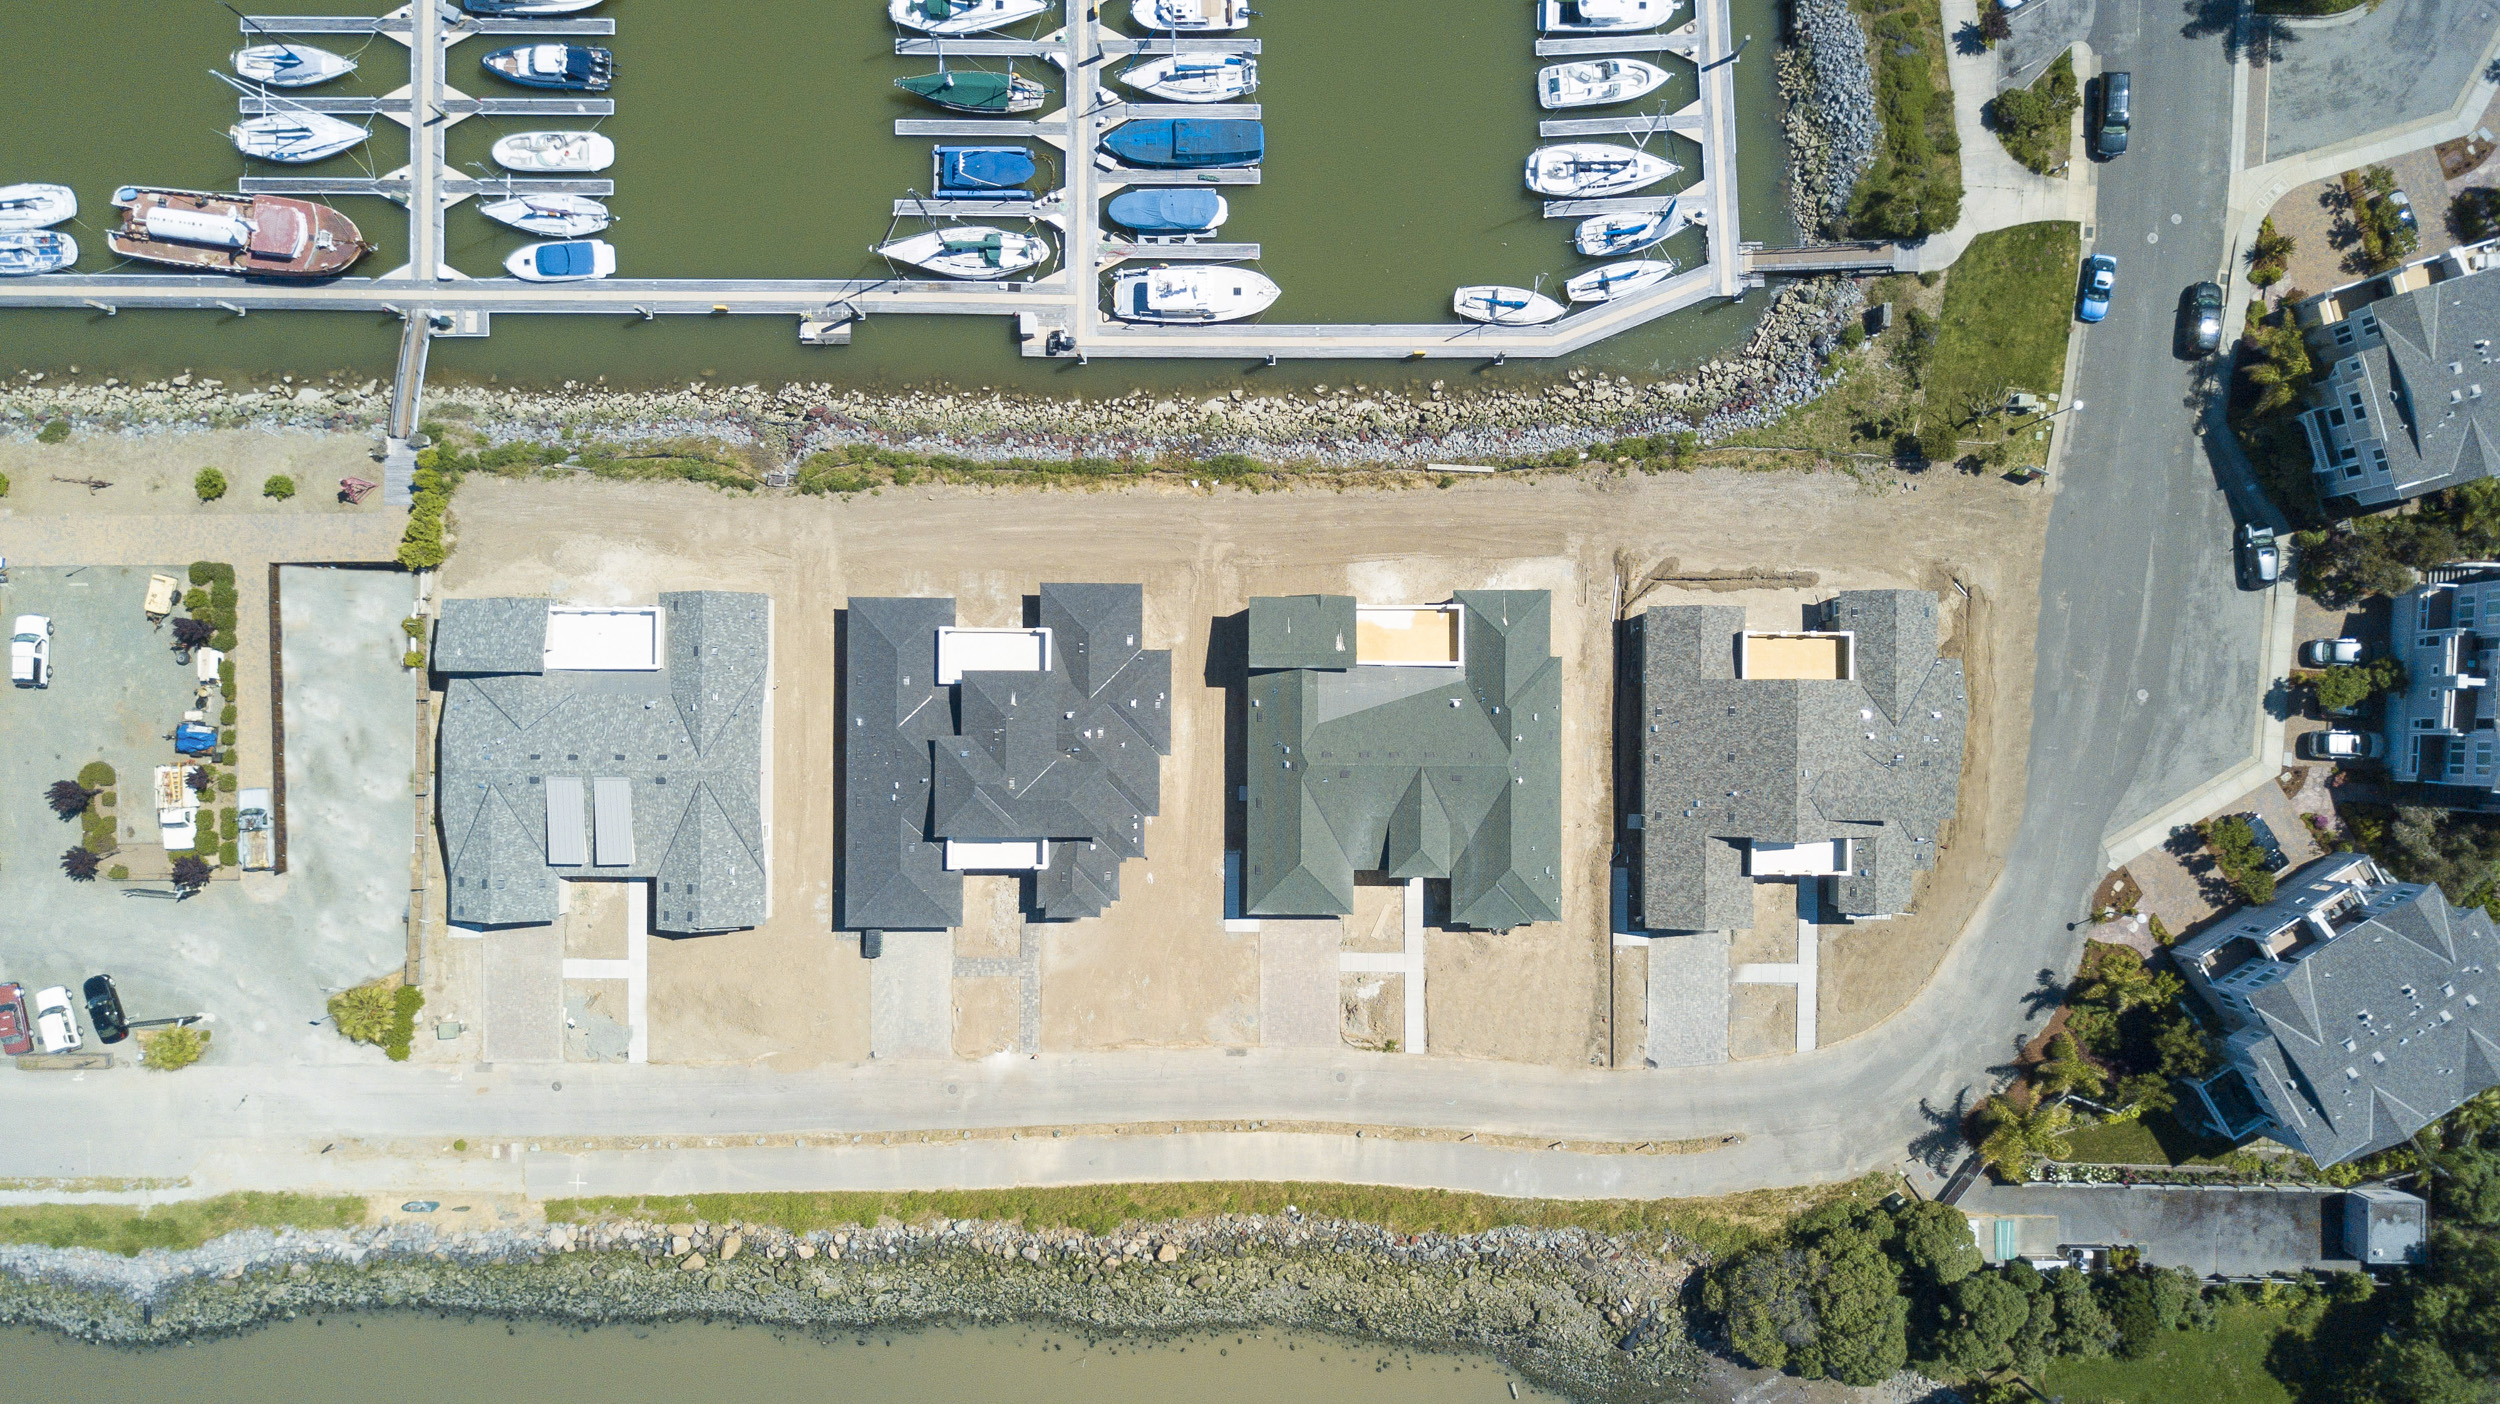 Paradise-Cay-Yacht-Harbor-Aerial (17 of 25).jpg